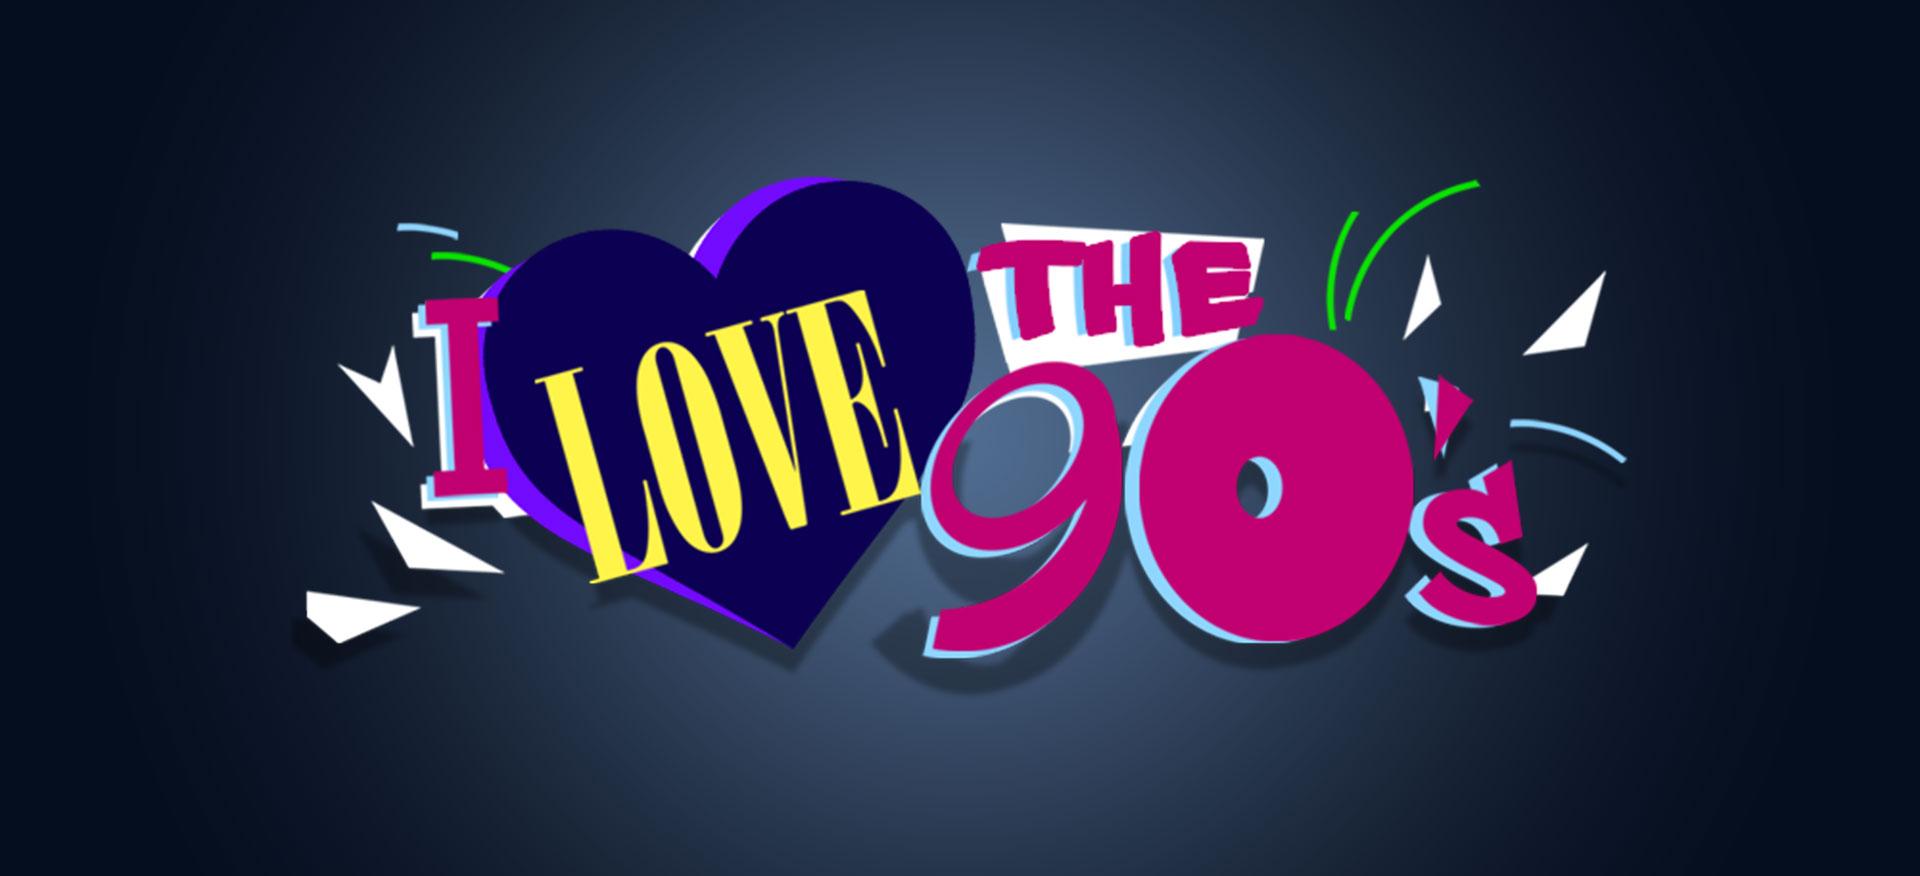 Playlist The Best 90s Playlists On Spotify Talk About Pop Music